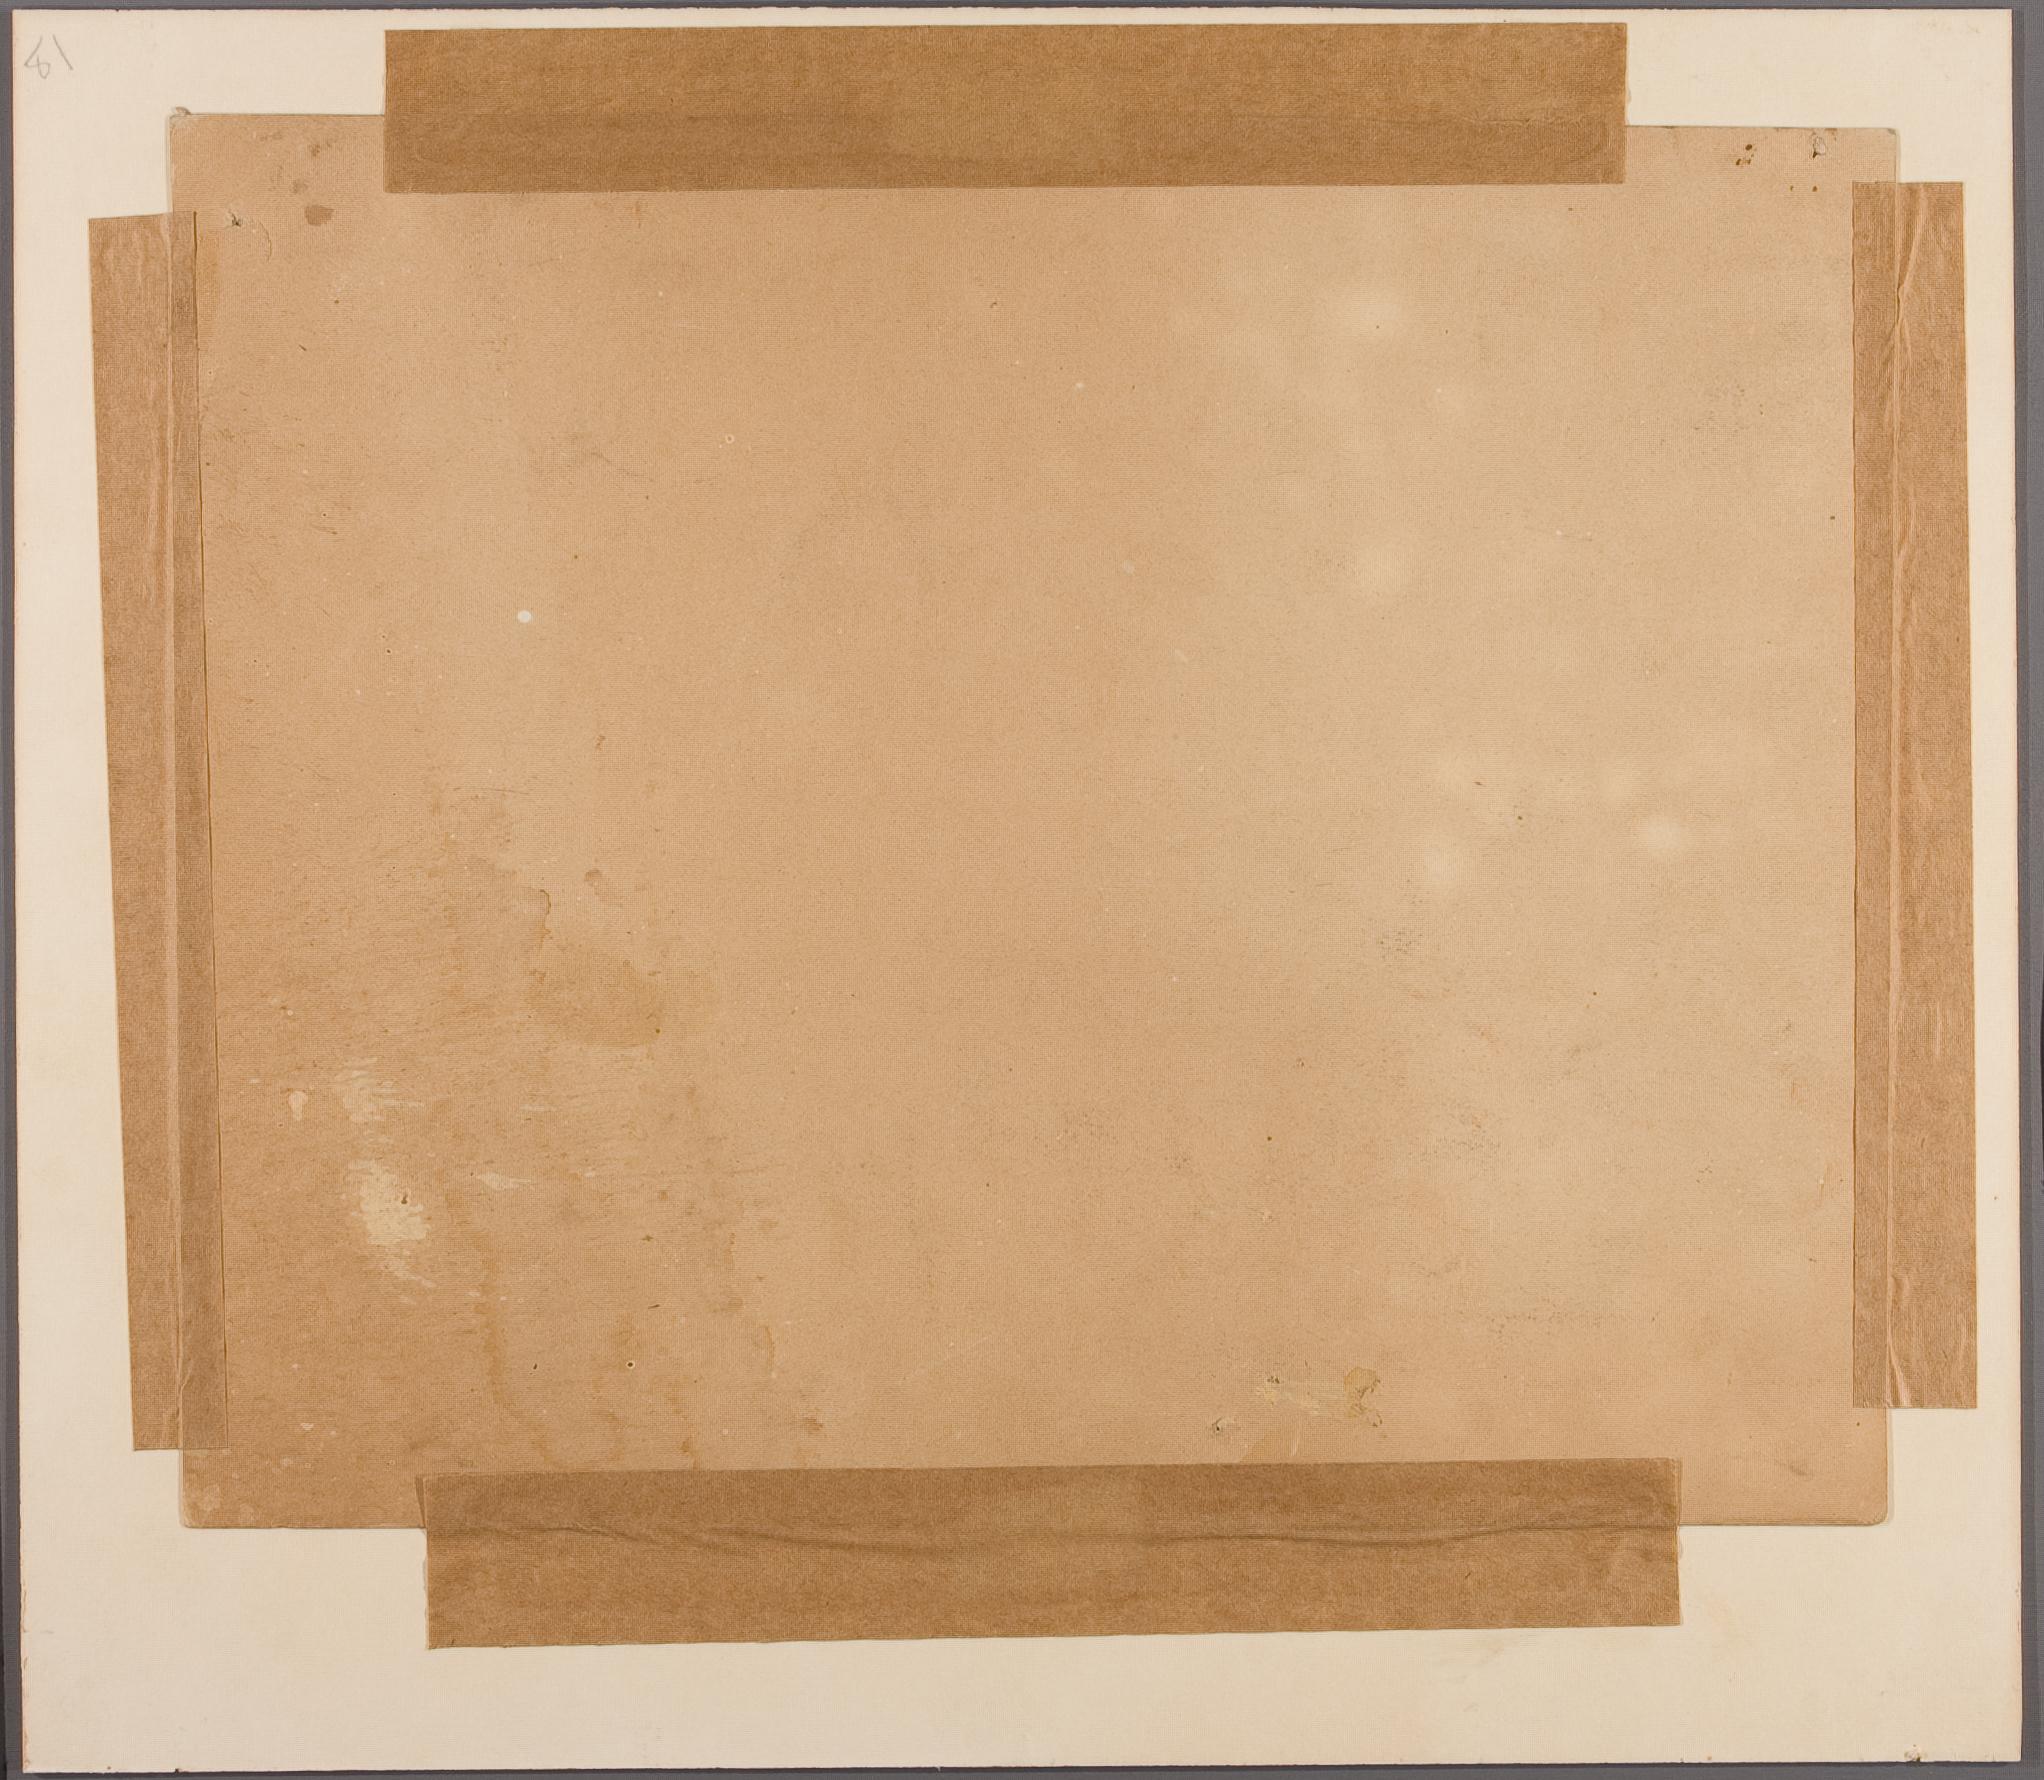 NC_Wyeth_drawing-02-before